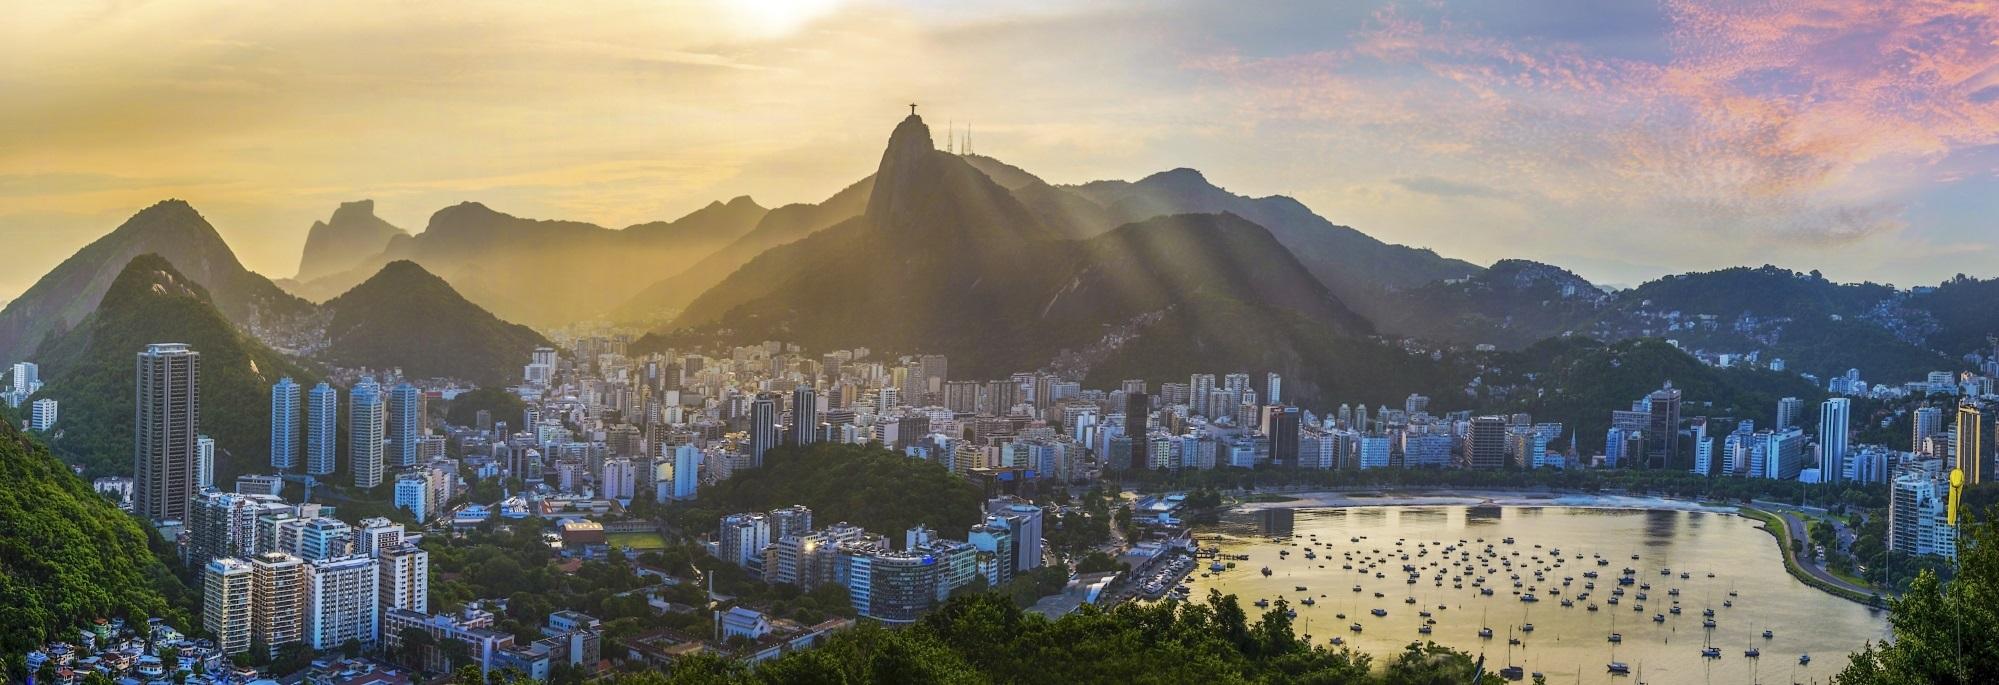 Rio de Janeiro Panorama Weltwunder